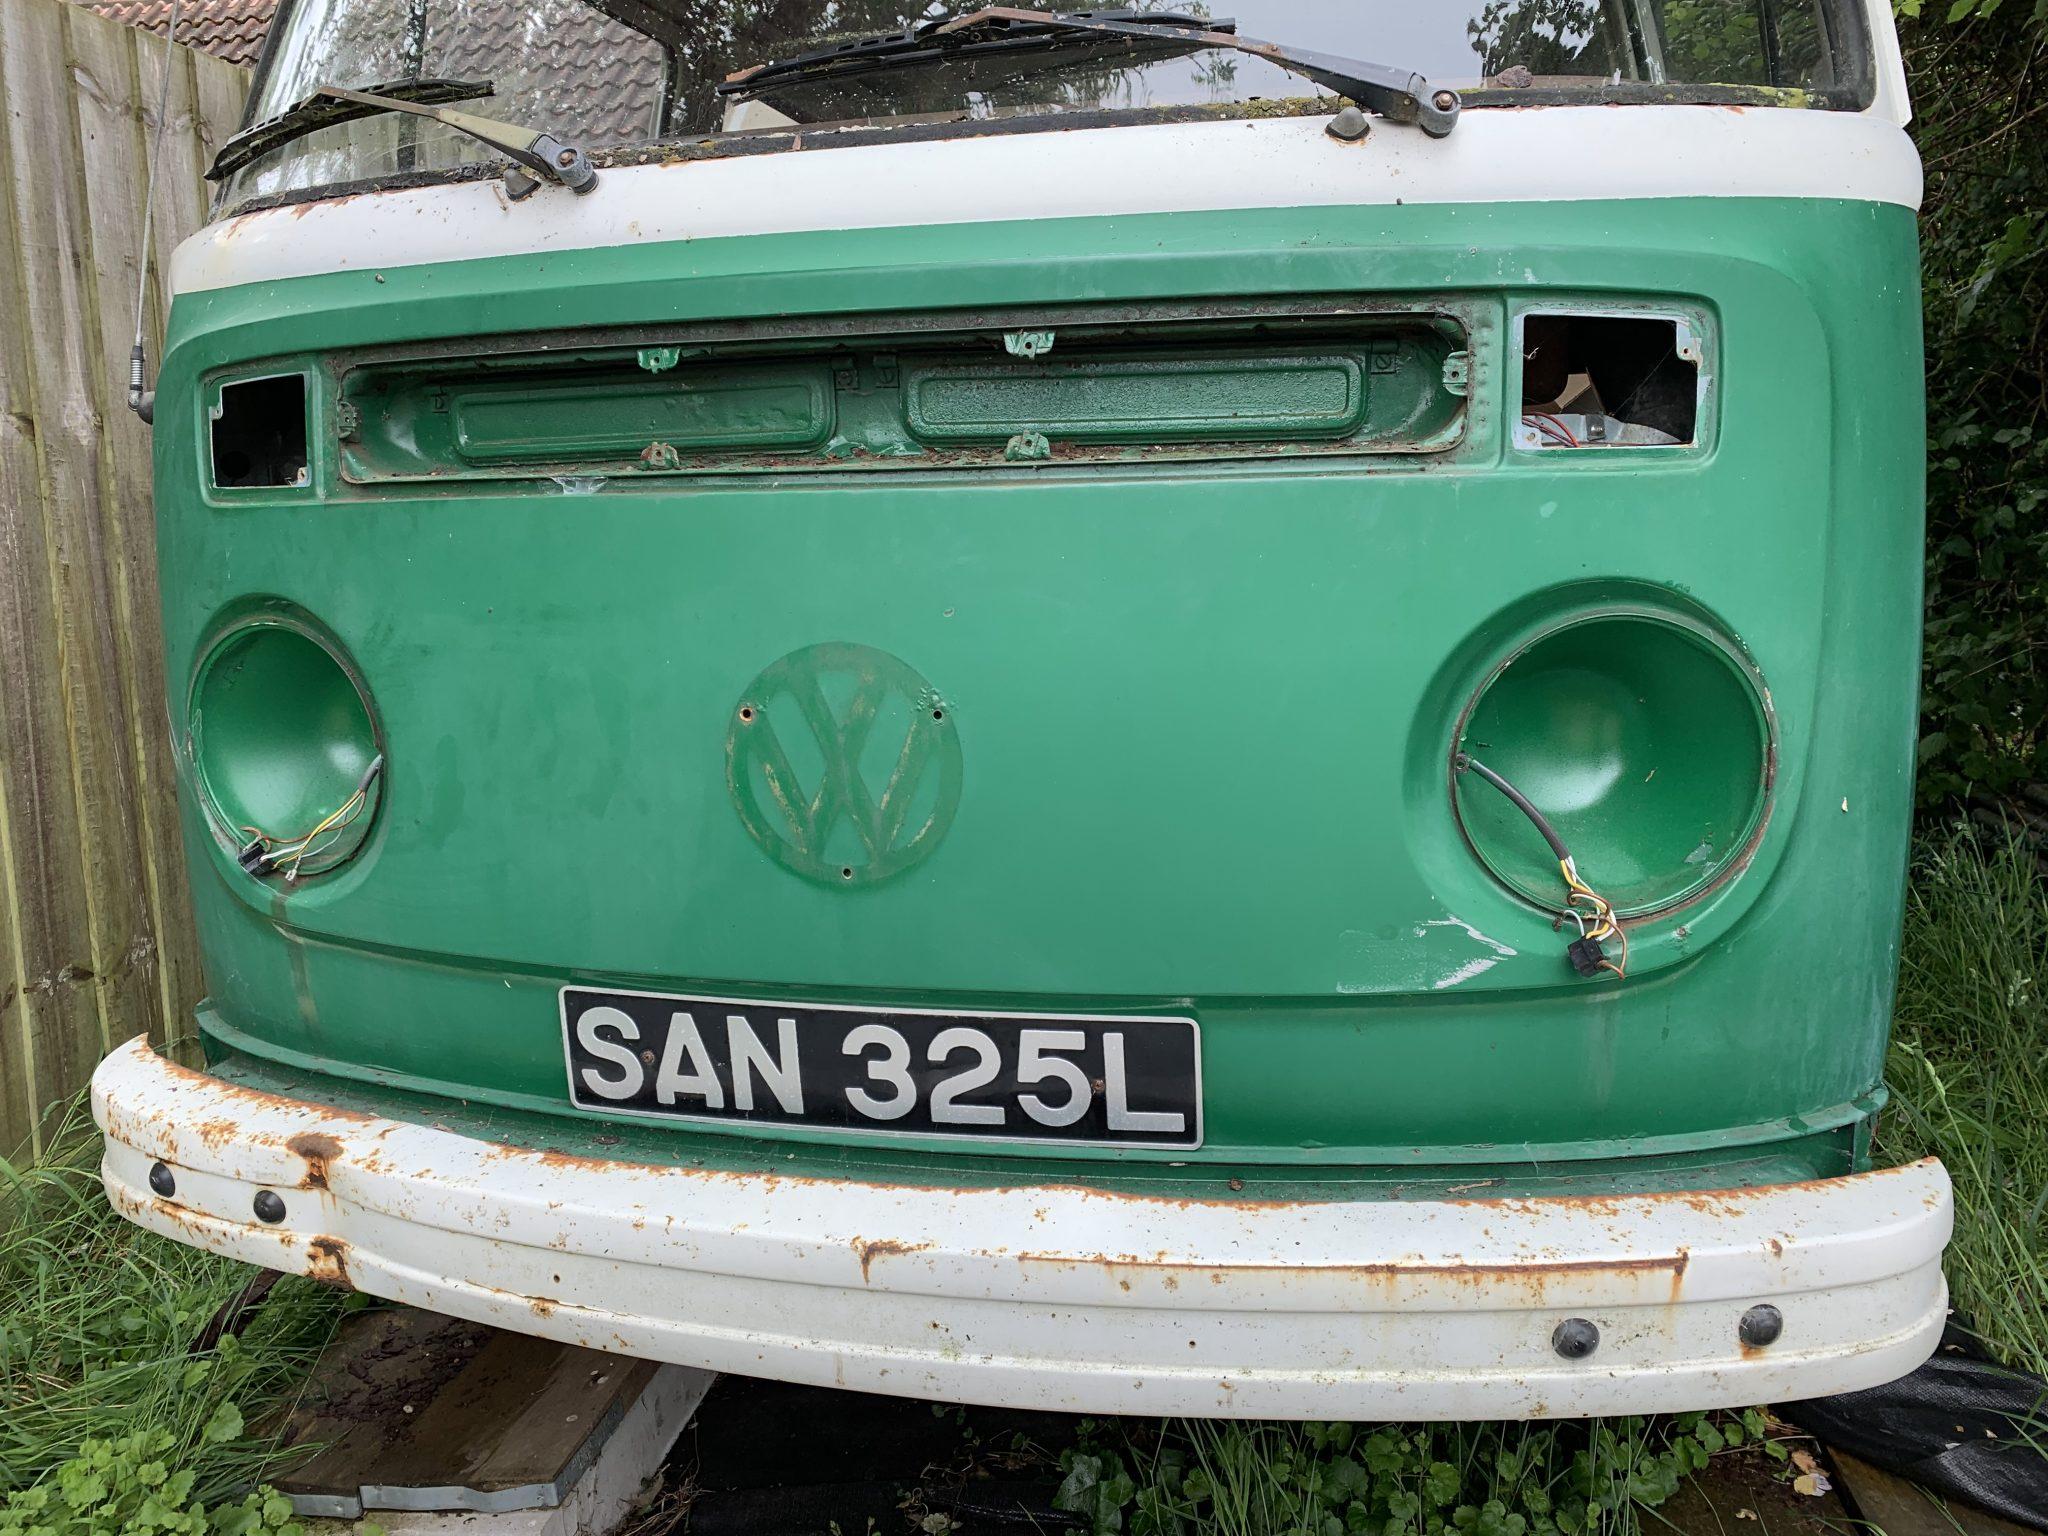 Beginning the restoration journey mid 2020 - 1973 VW T2 - Bridge